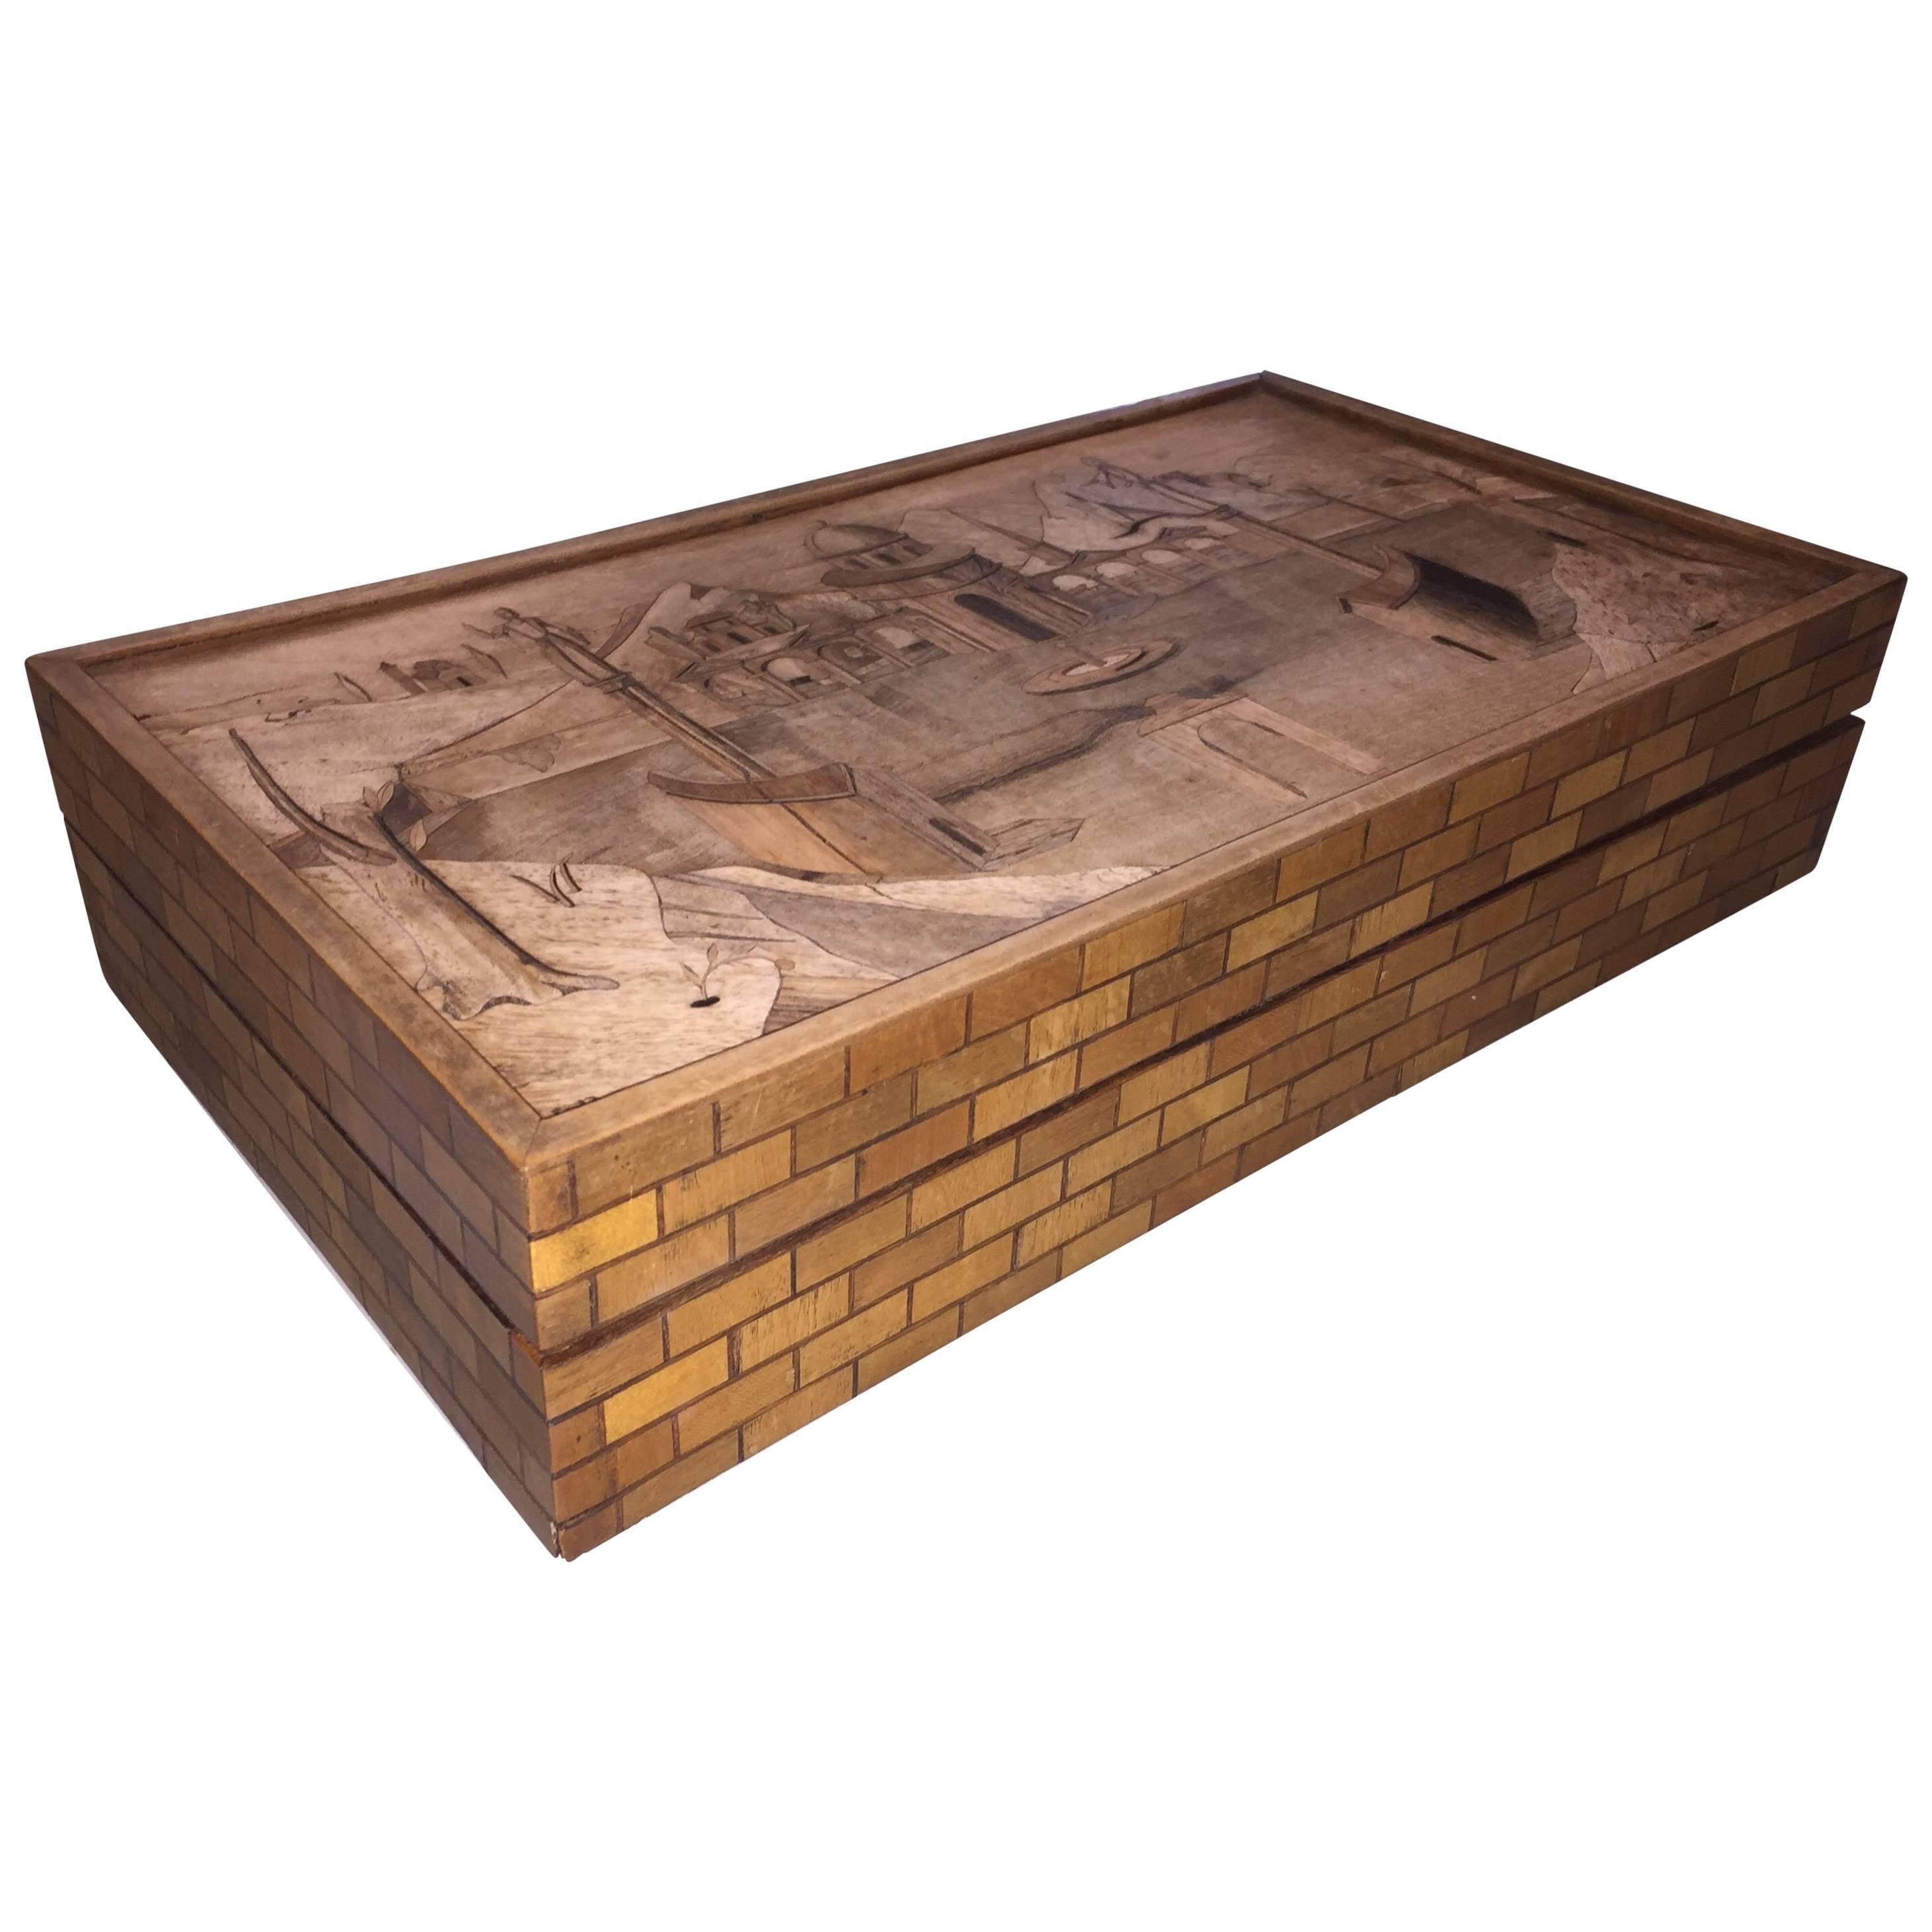 Intarsia Box by Enrico Bernardi